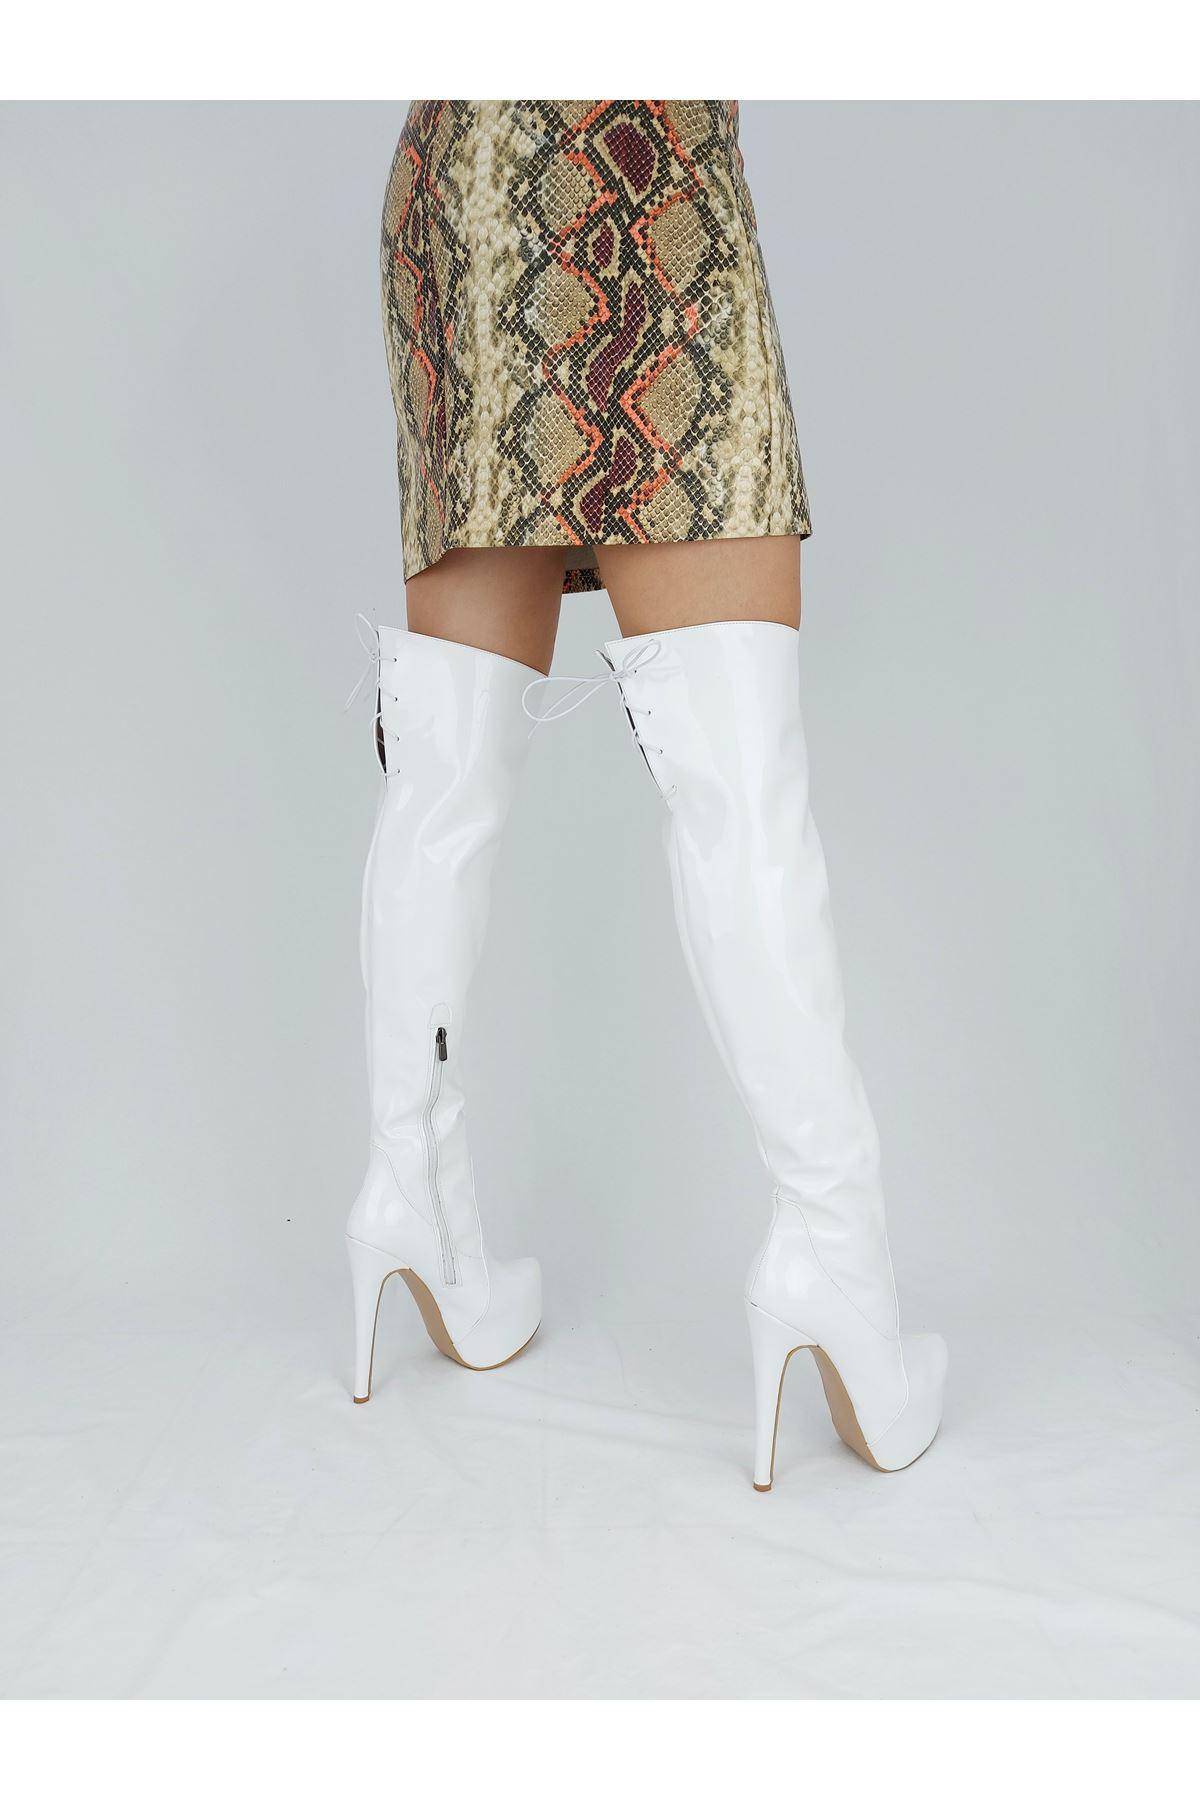 Rinna Beyaz Rugan Bağcıklı Yüksek Topuklu Çizme